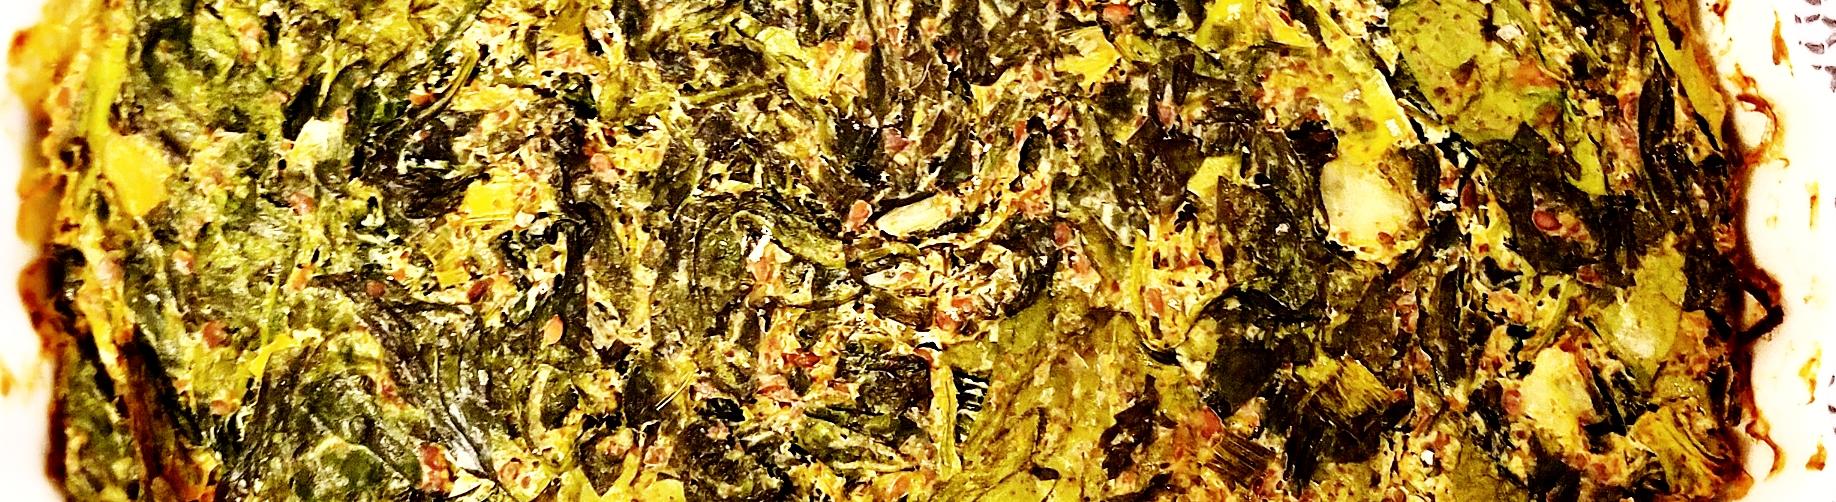 Jackson Pollock? Nah, it's just a frittata.